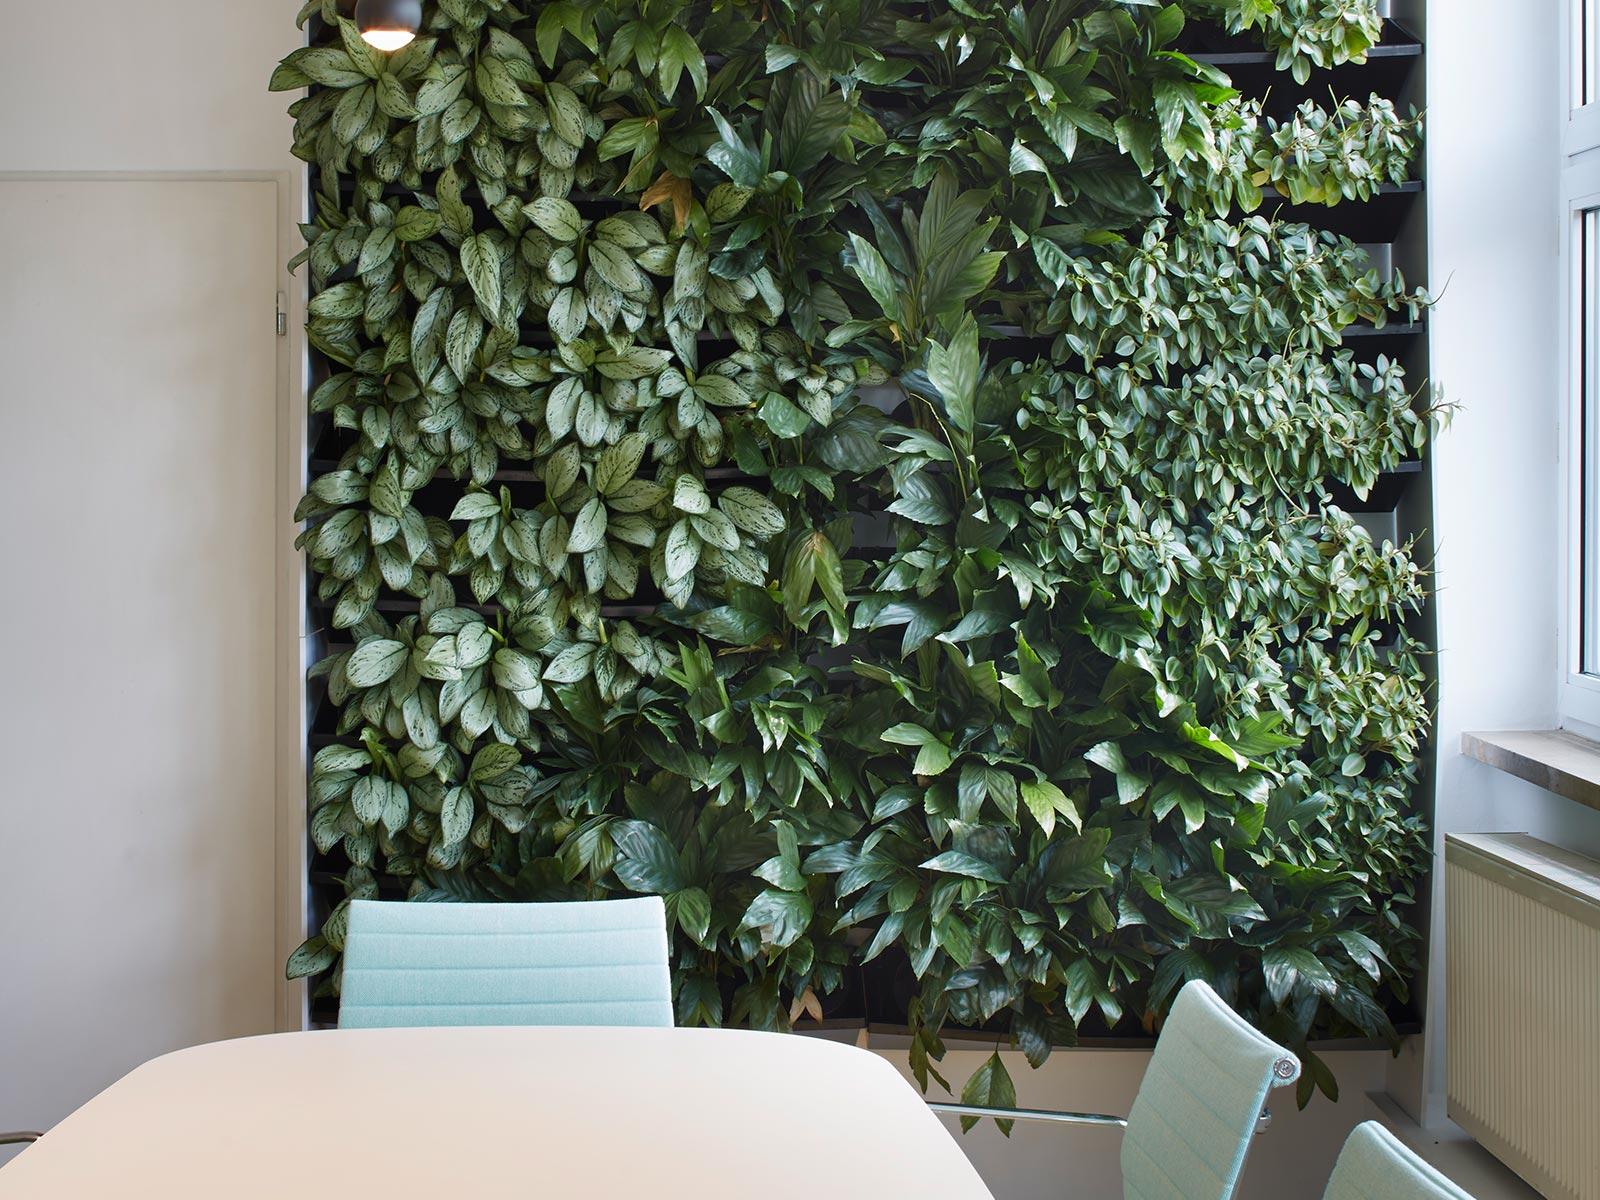 kerl cie frankfurt hydroflora gmbh. Black Bedroom Furniture Sets. Home Design Ideas